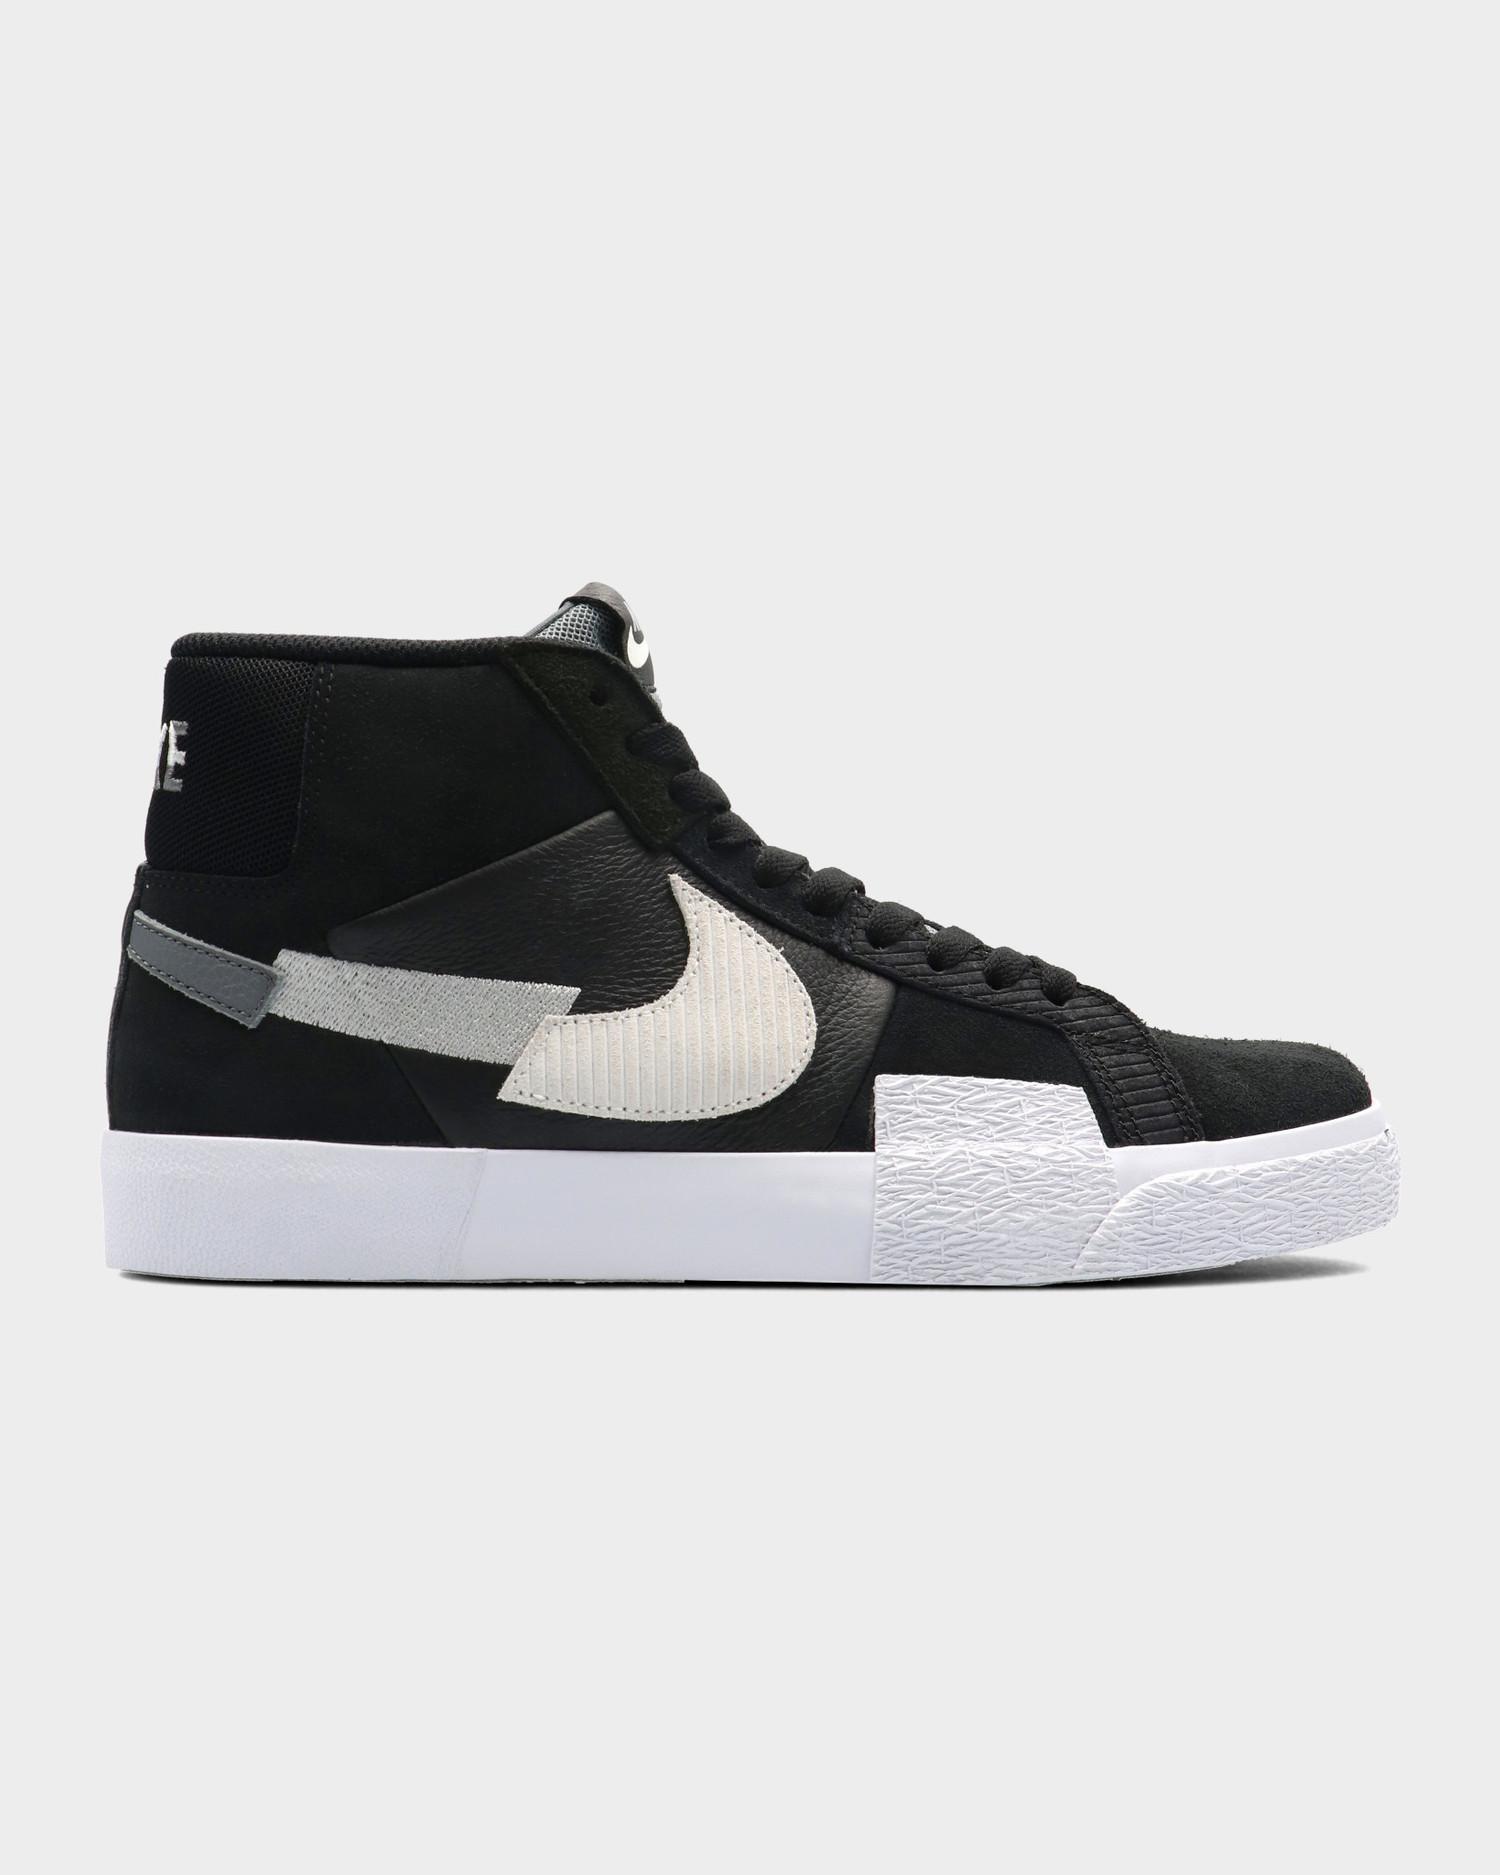 Nike SB Zoom Blazer Mid PRM Black/White